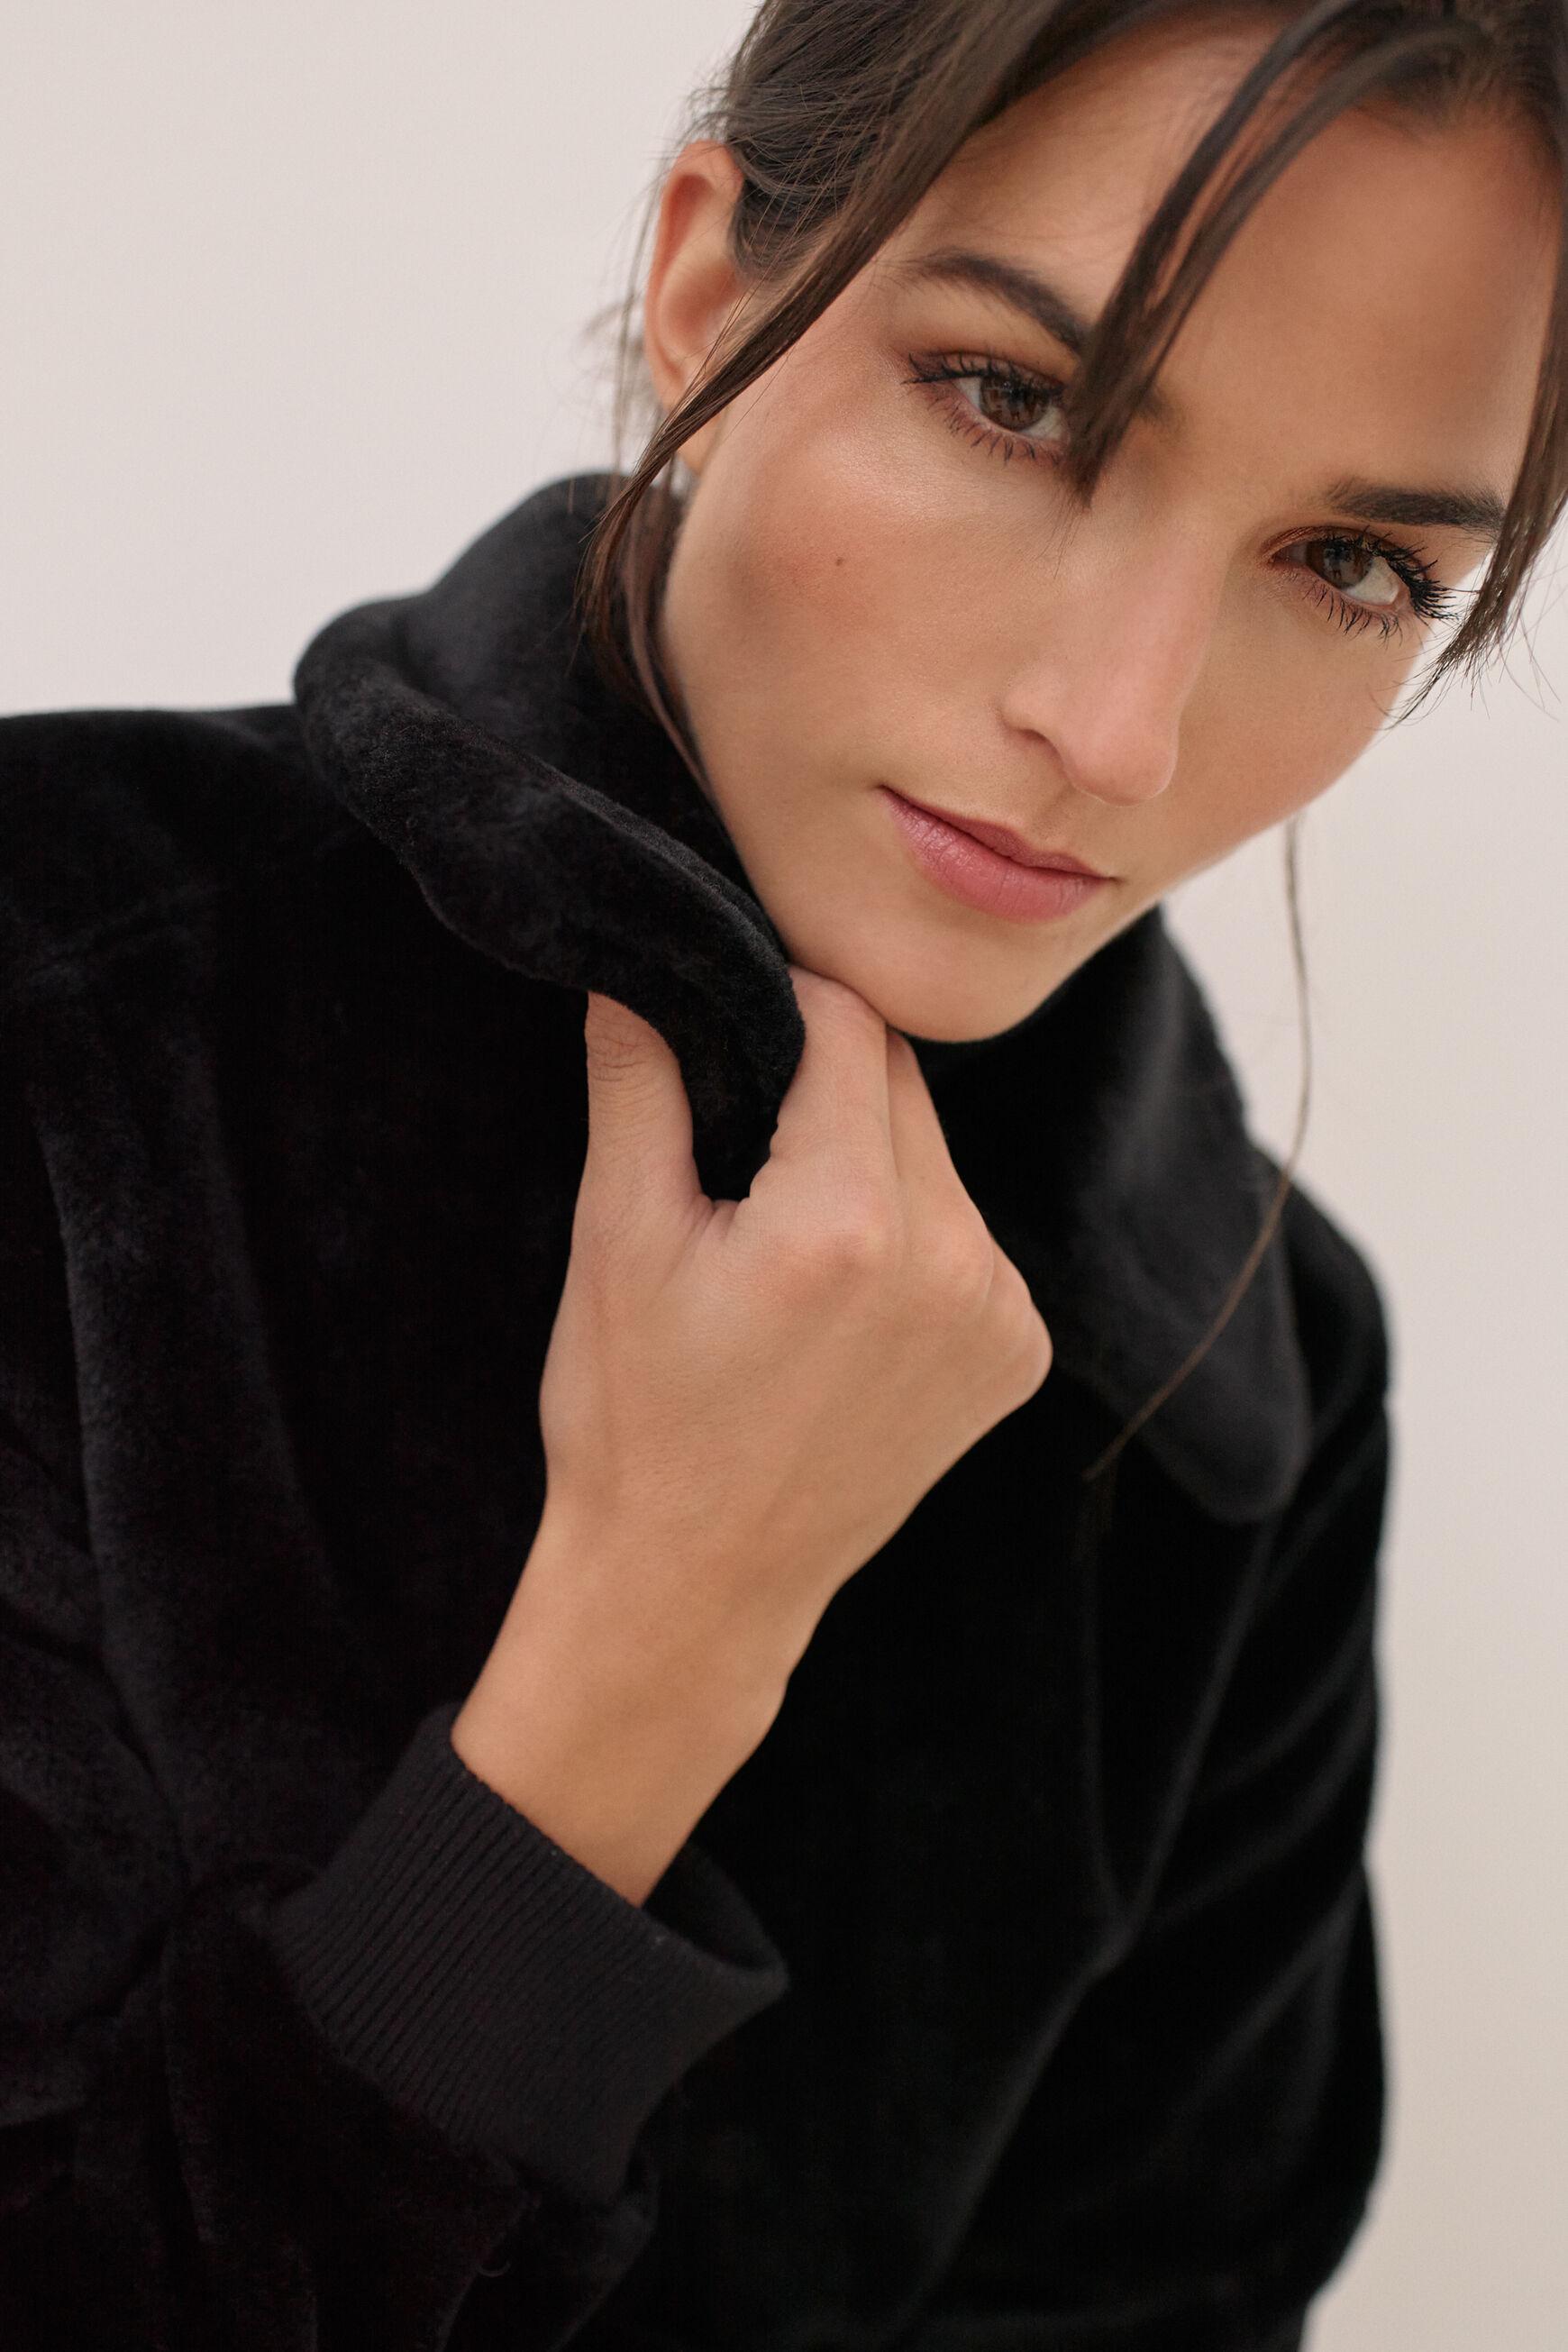 Manteau fausse peau Jean : Manteau femme Kaki | CAROLL